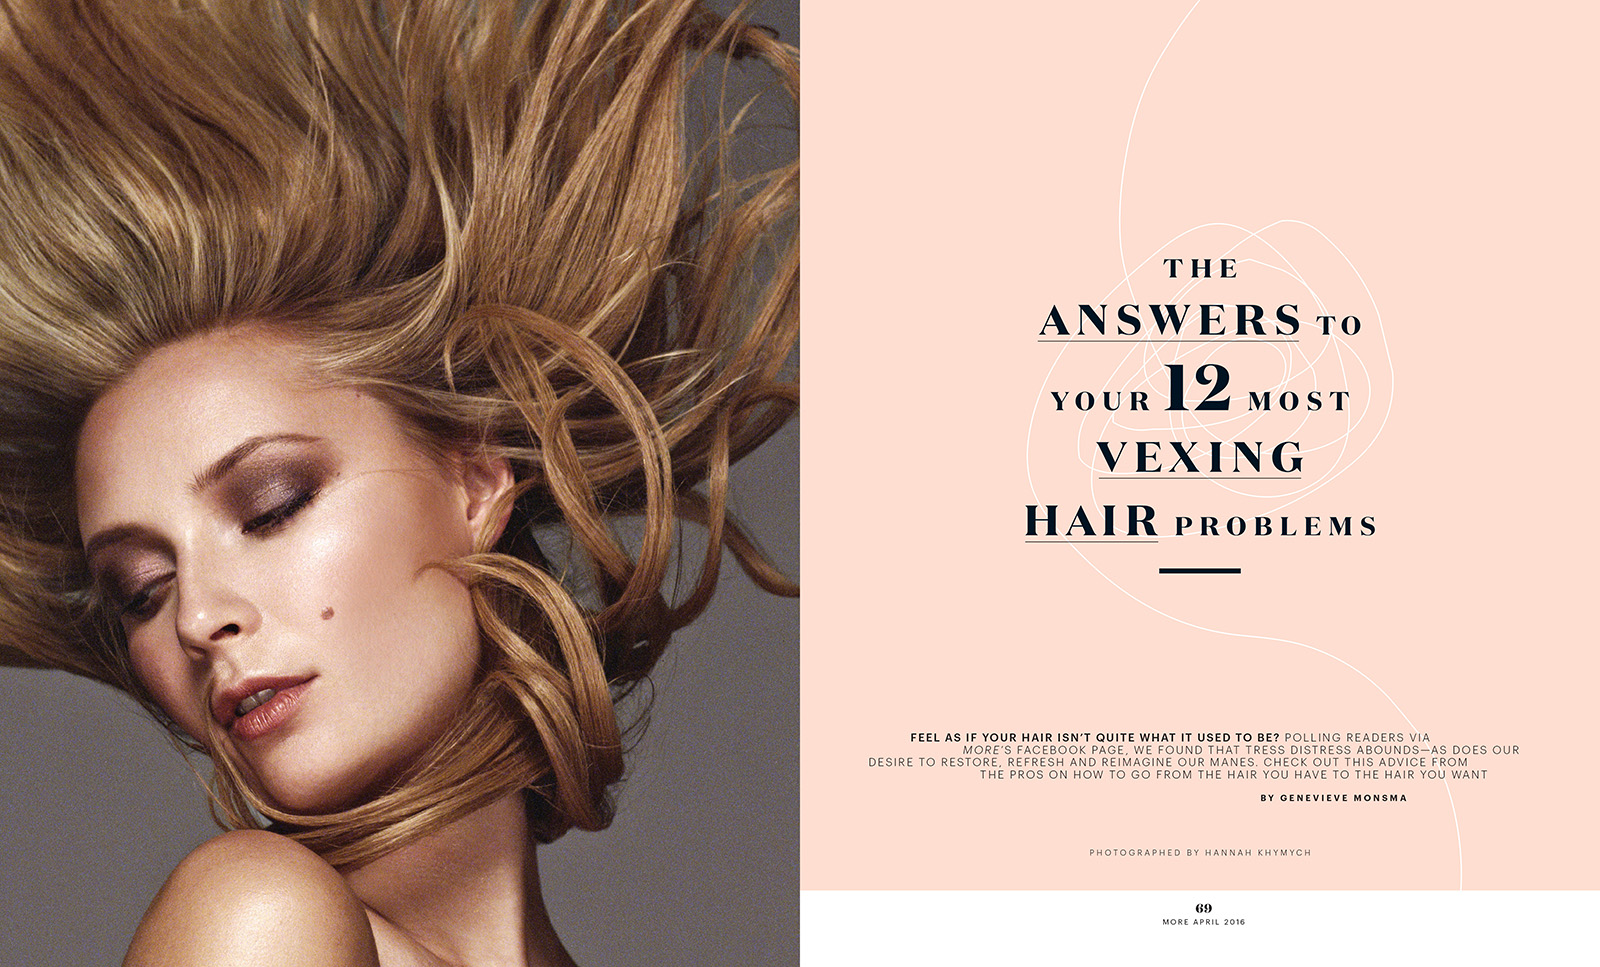 068-073 MR0416 Well_Hair-1 copy.jpg